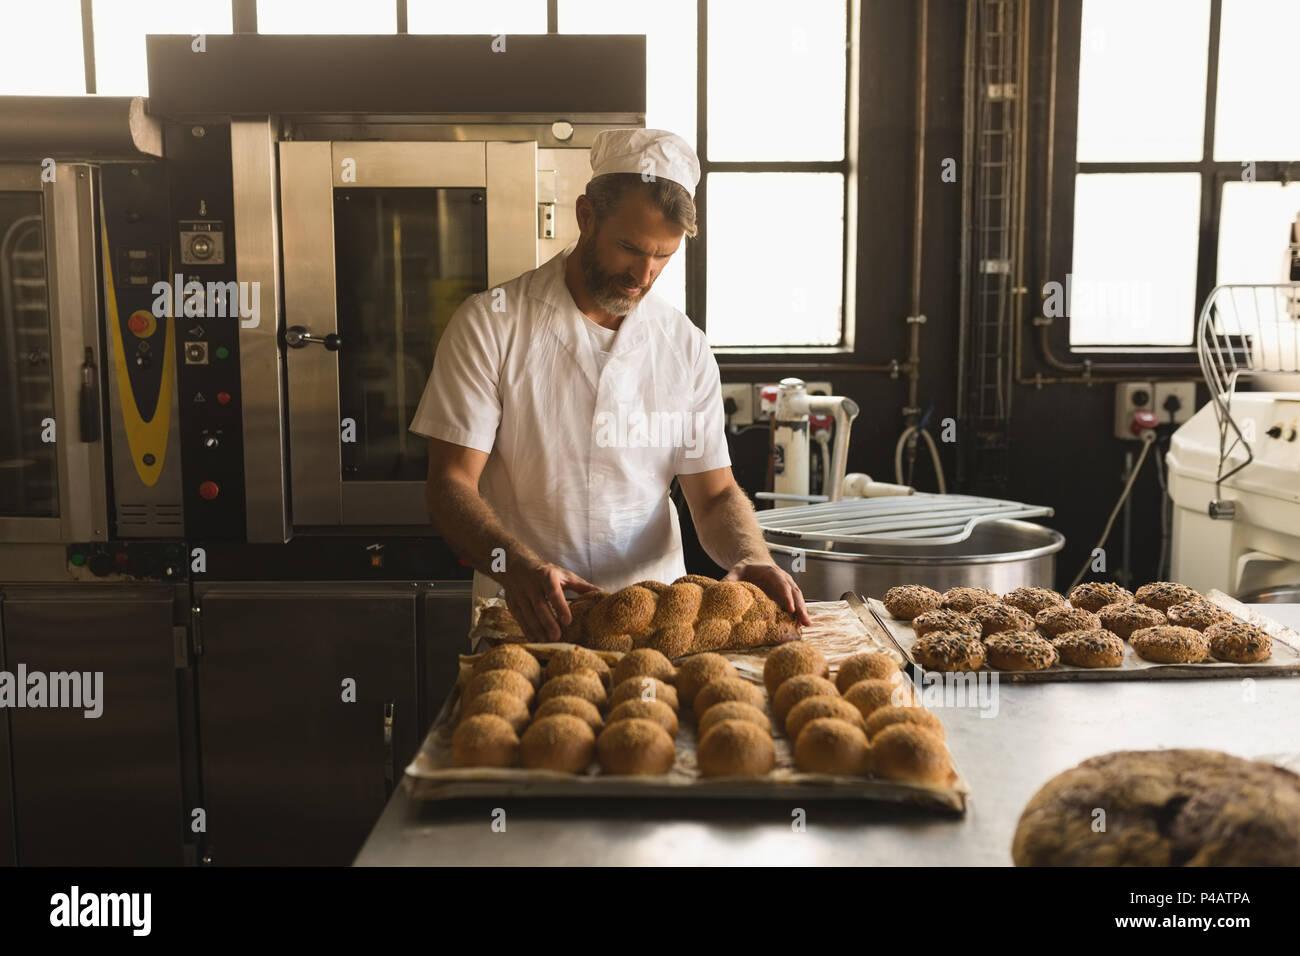 Männliche baker arrangieren gebackene süße Nahrungsmittel Stockbild